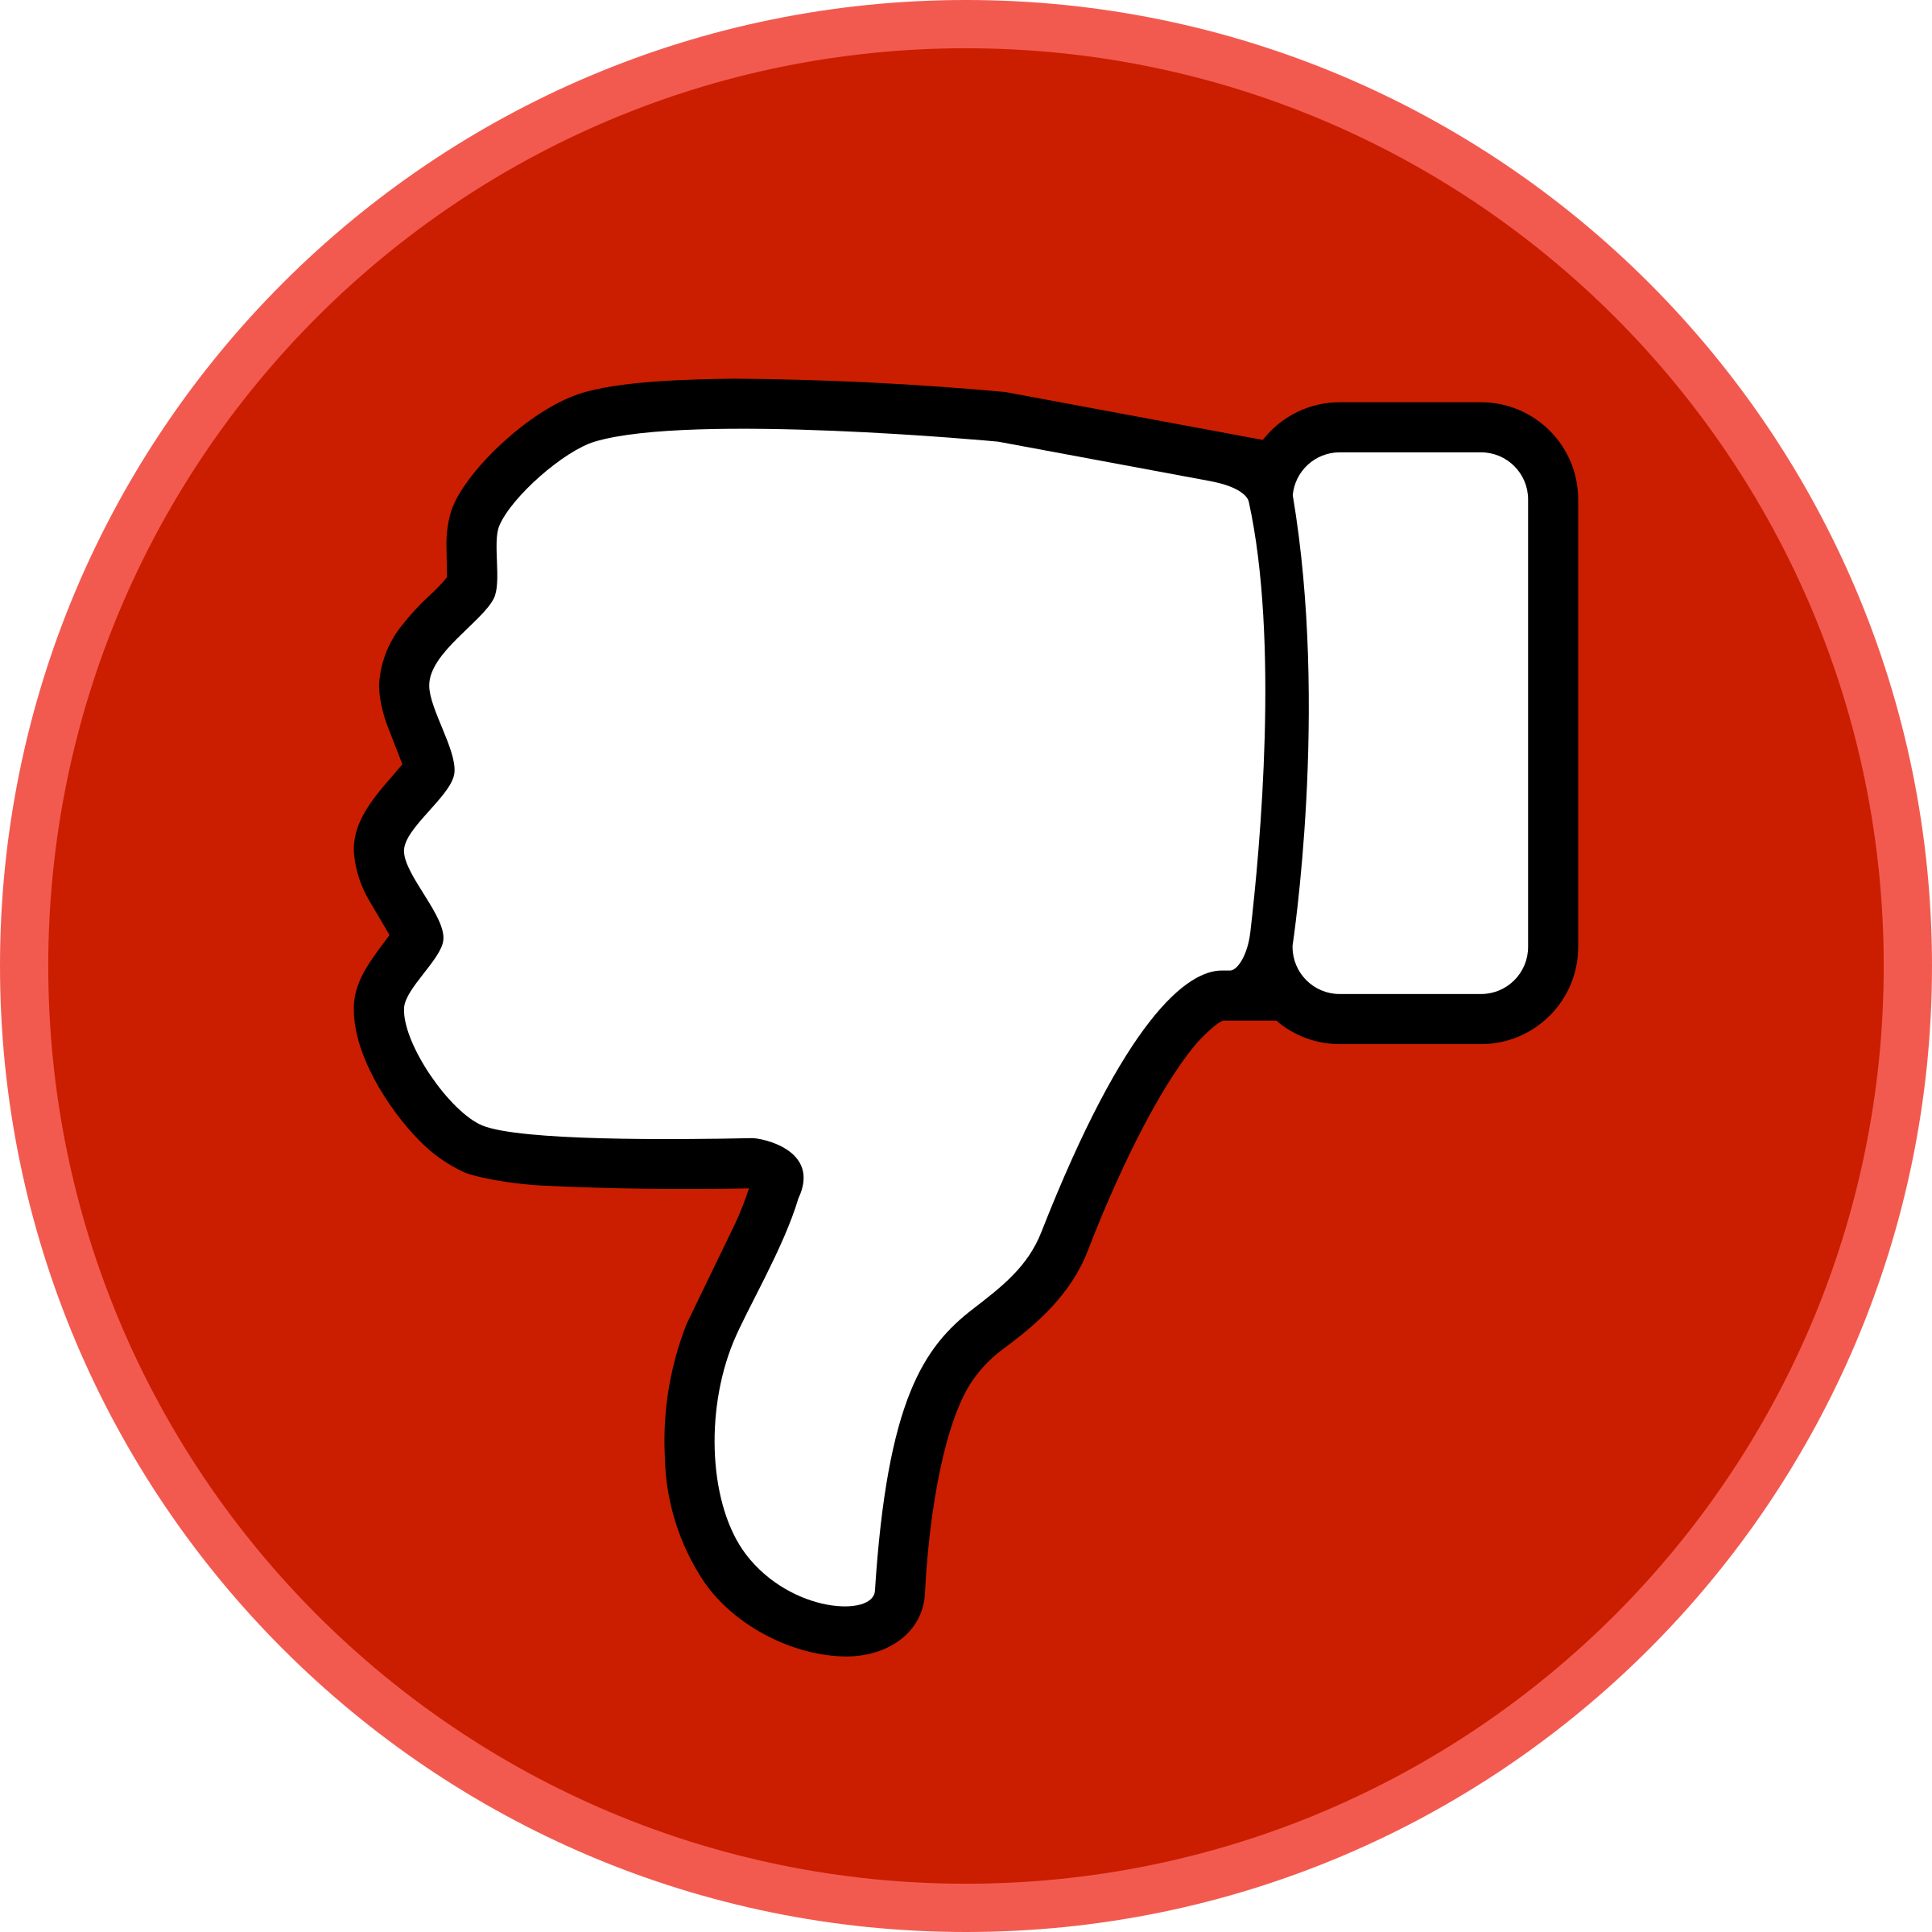 Thumbs Down Circle By J4p4n Thumbs Down Clip Art Sticker Template